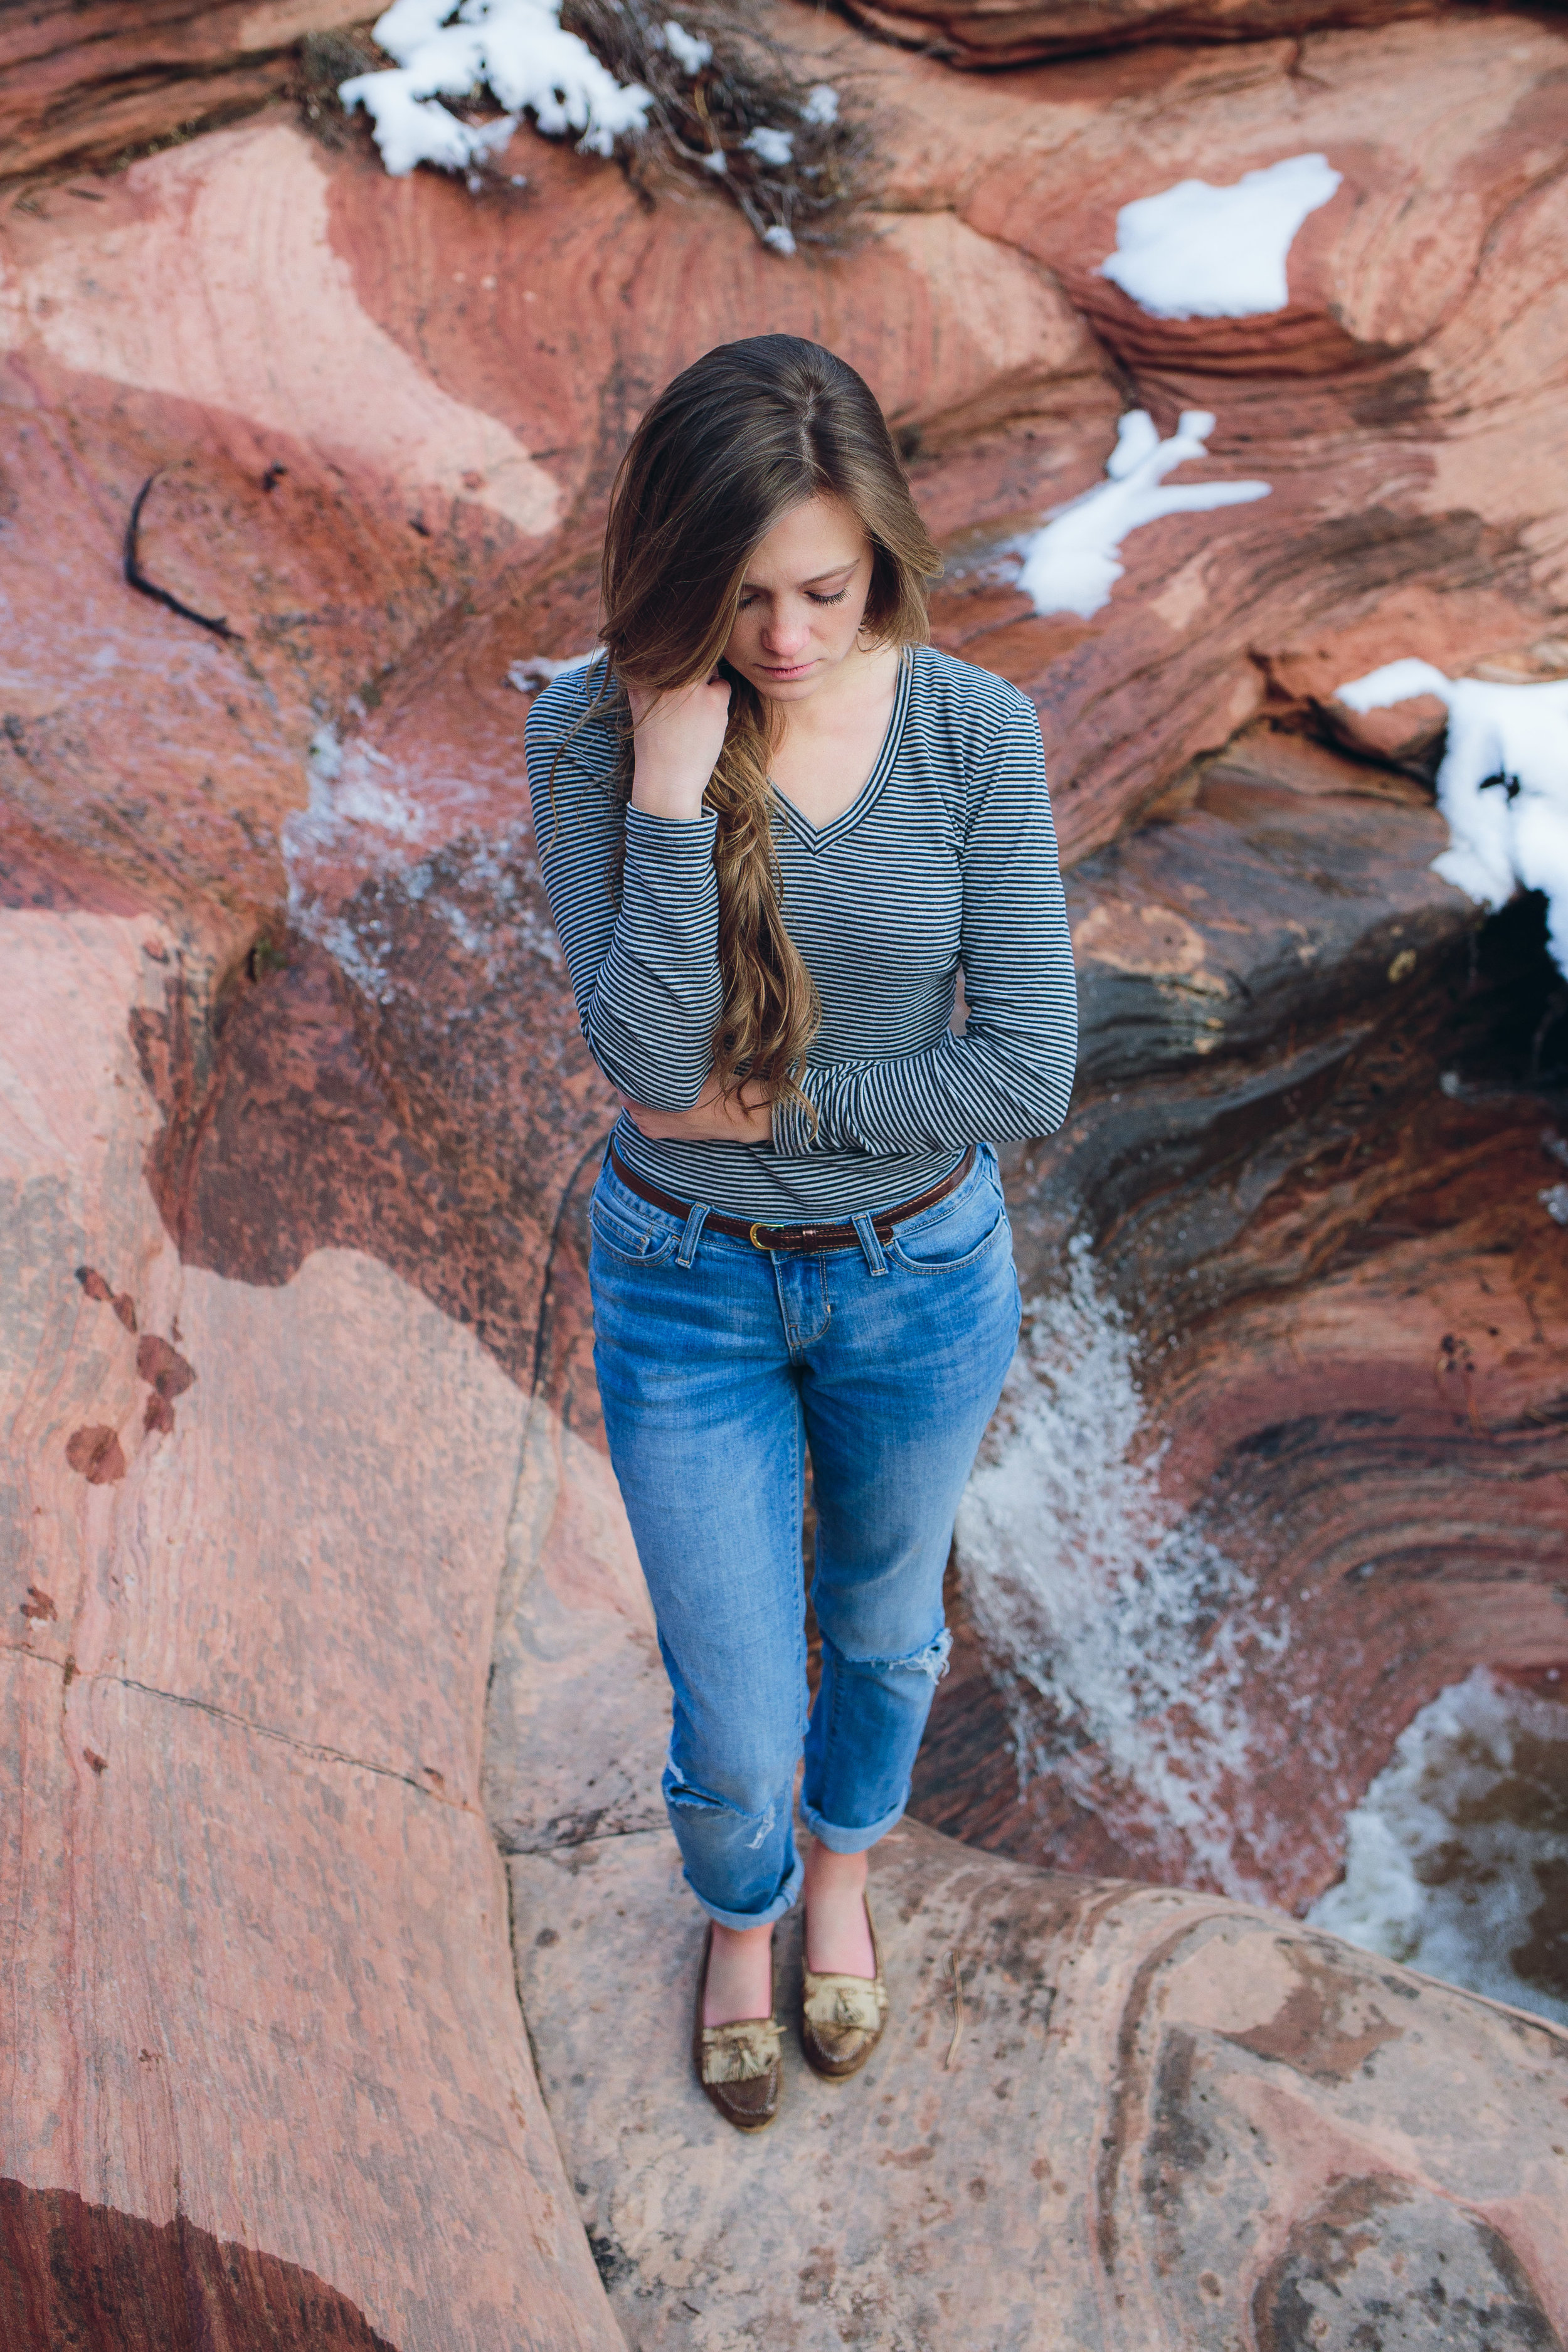 Beautiful girl in Zion red rock water fall